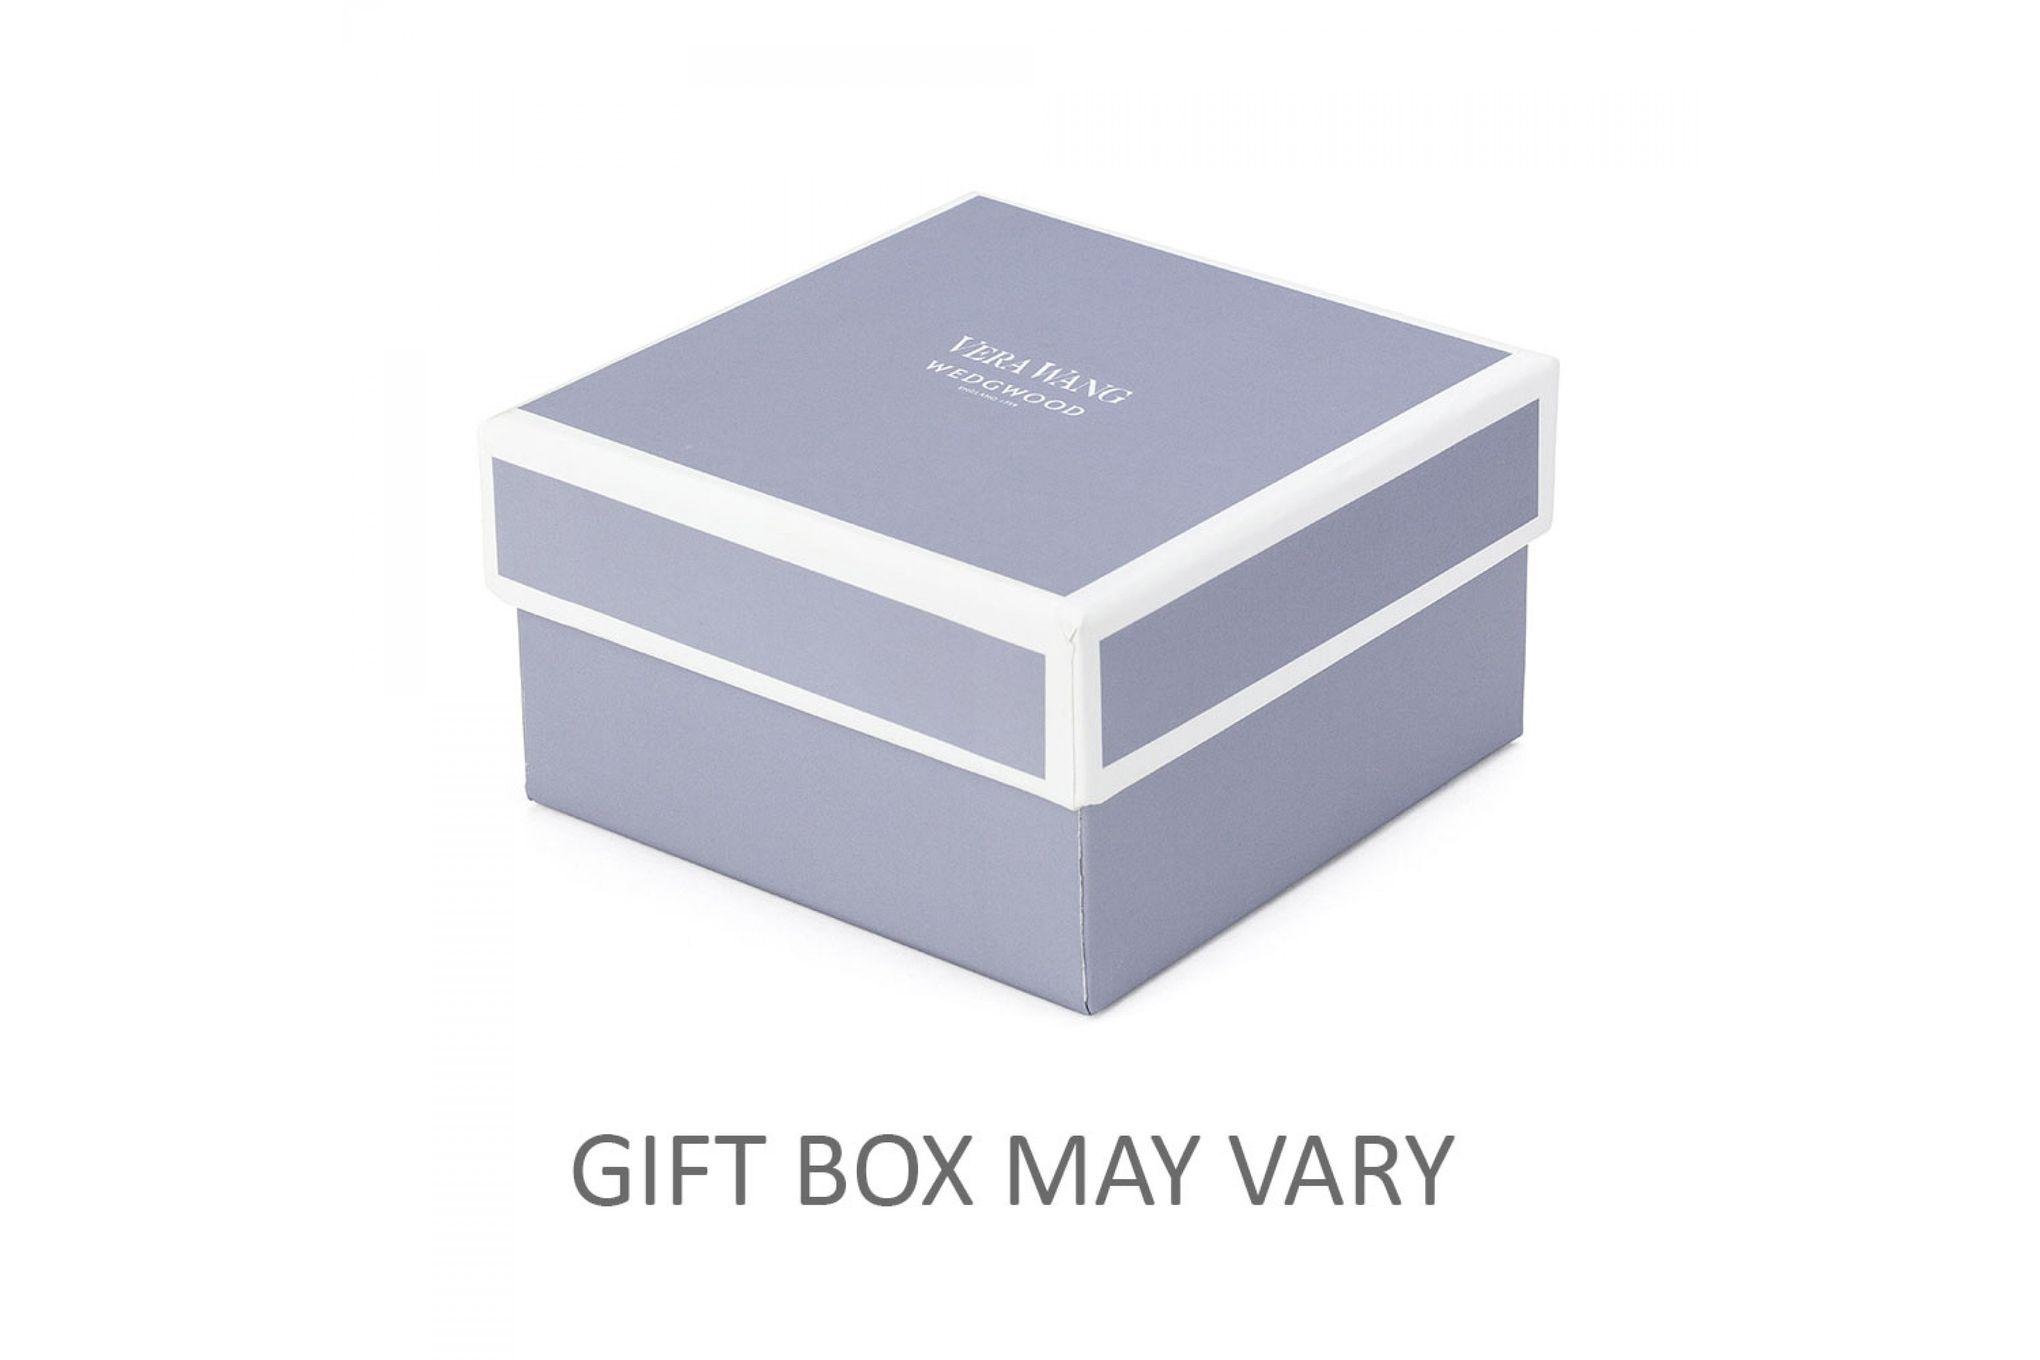 Vera Wang for Wedgwood Gifts & Accessories Piggy Bank Silverware thumb 2